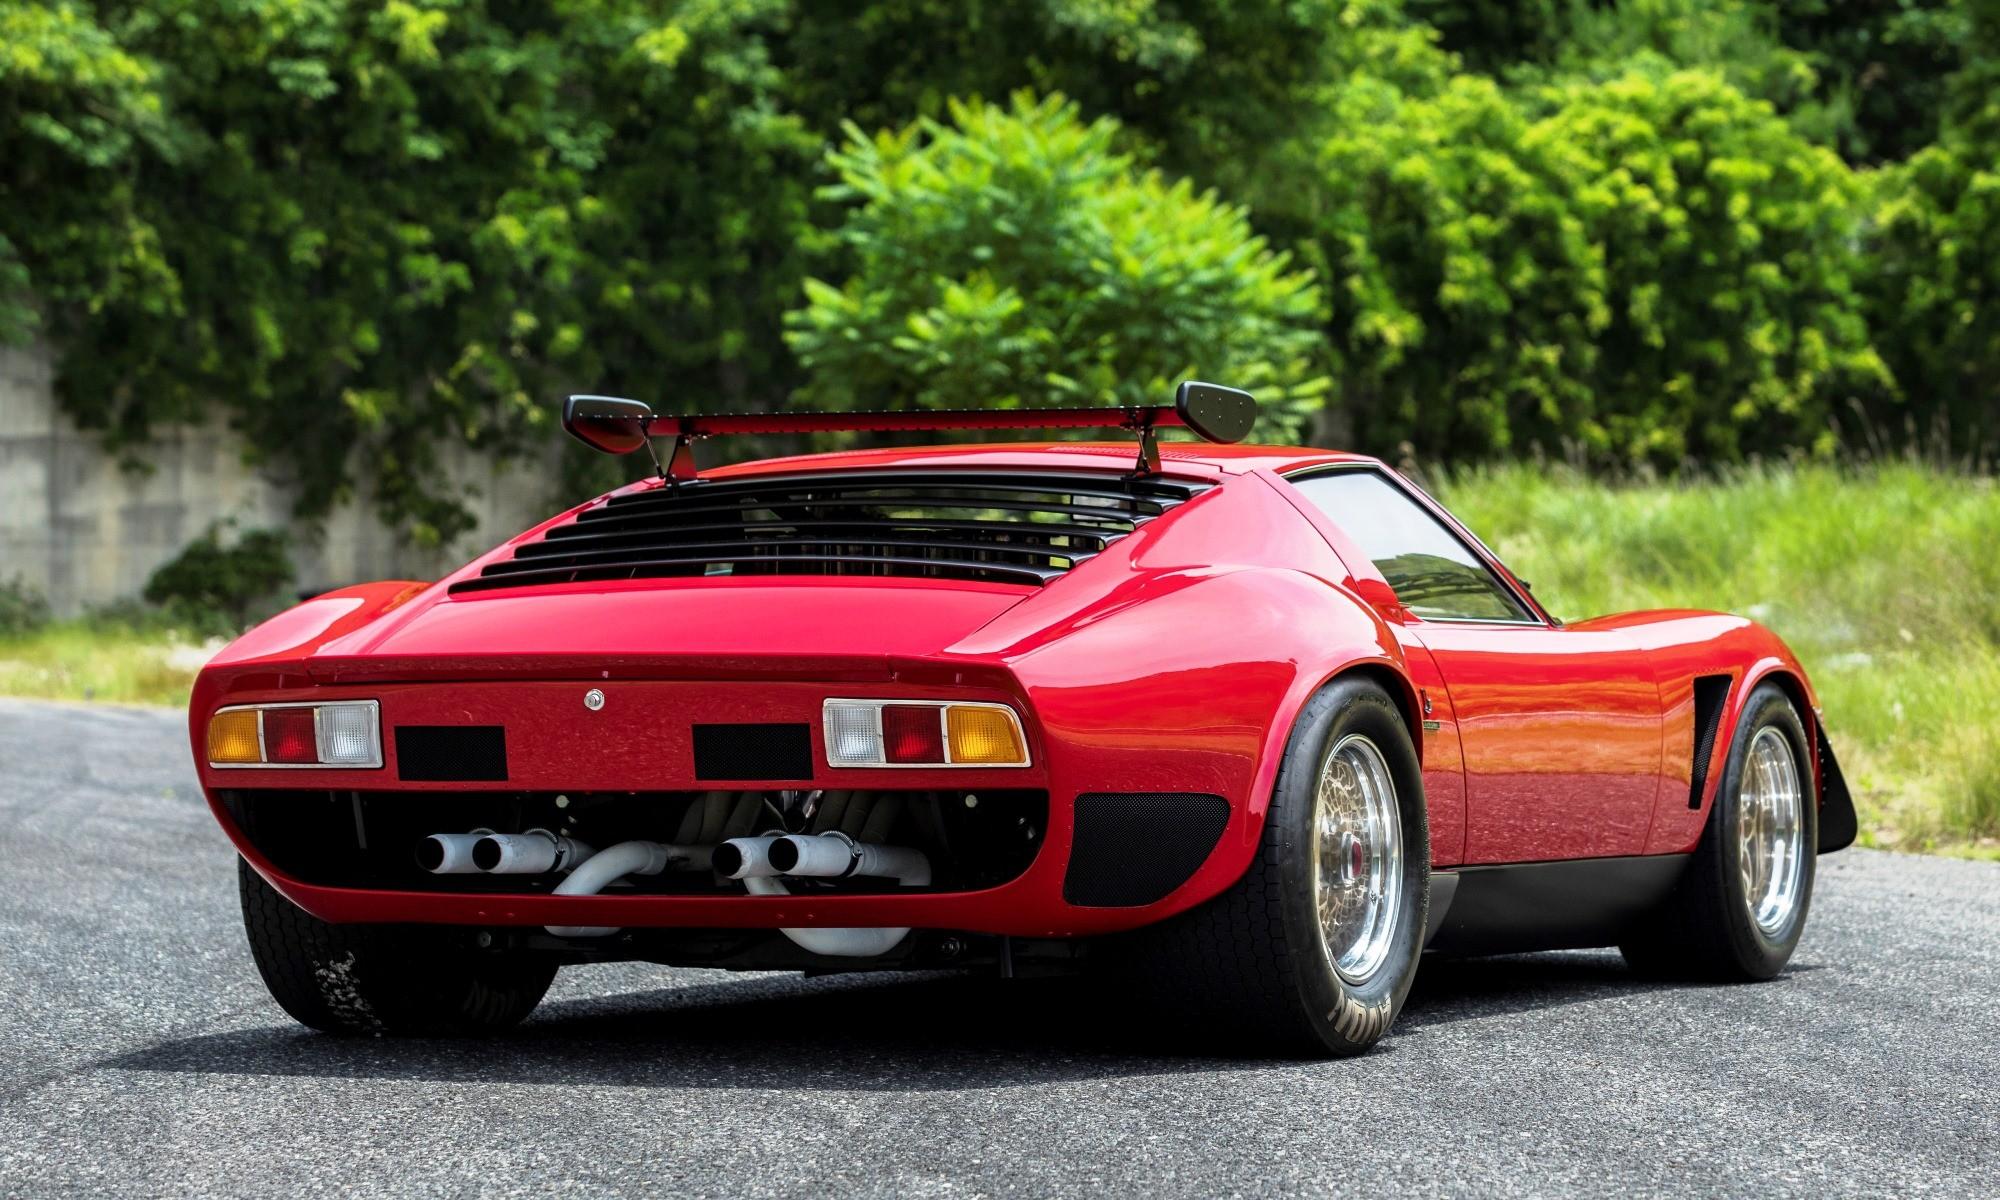 Lamborghini Miura SVR rear